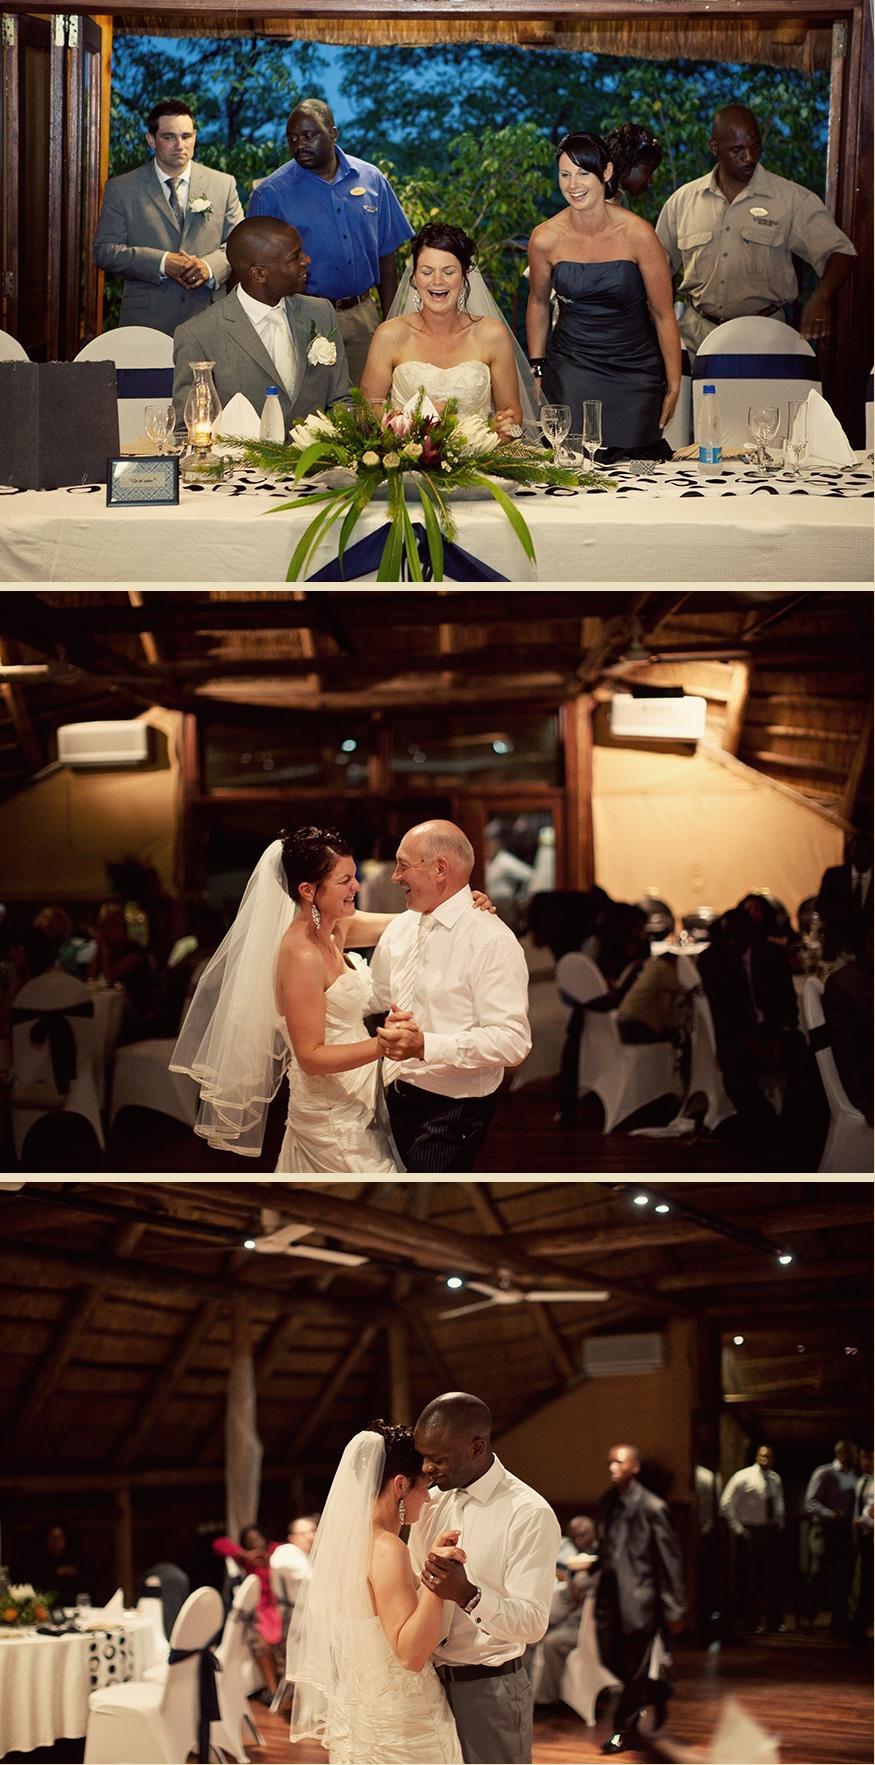 Brisbane Wedding Phoographer Blog-collage-1329191578475